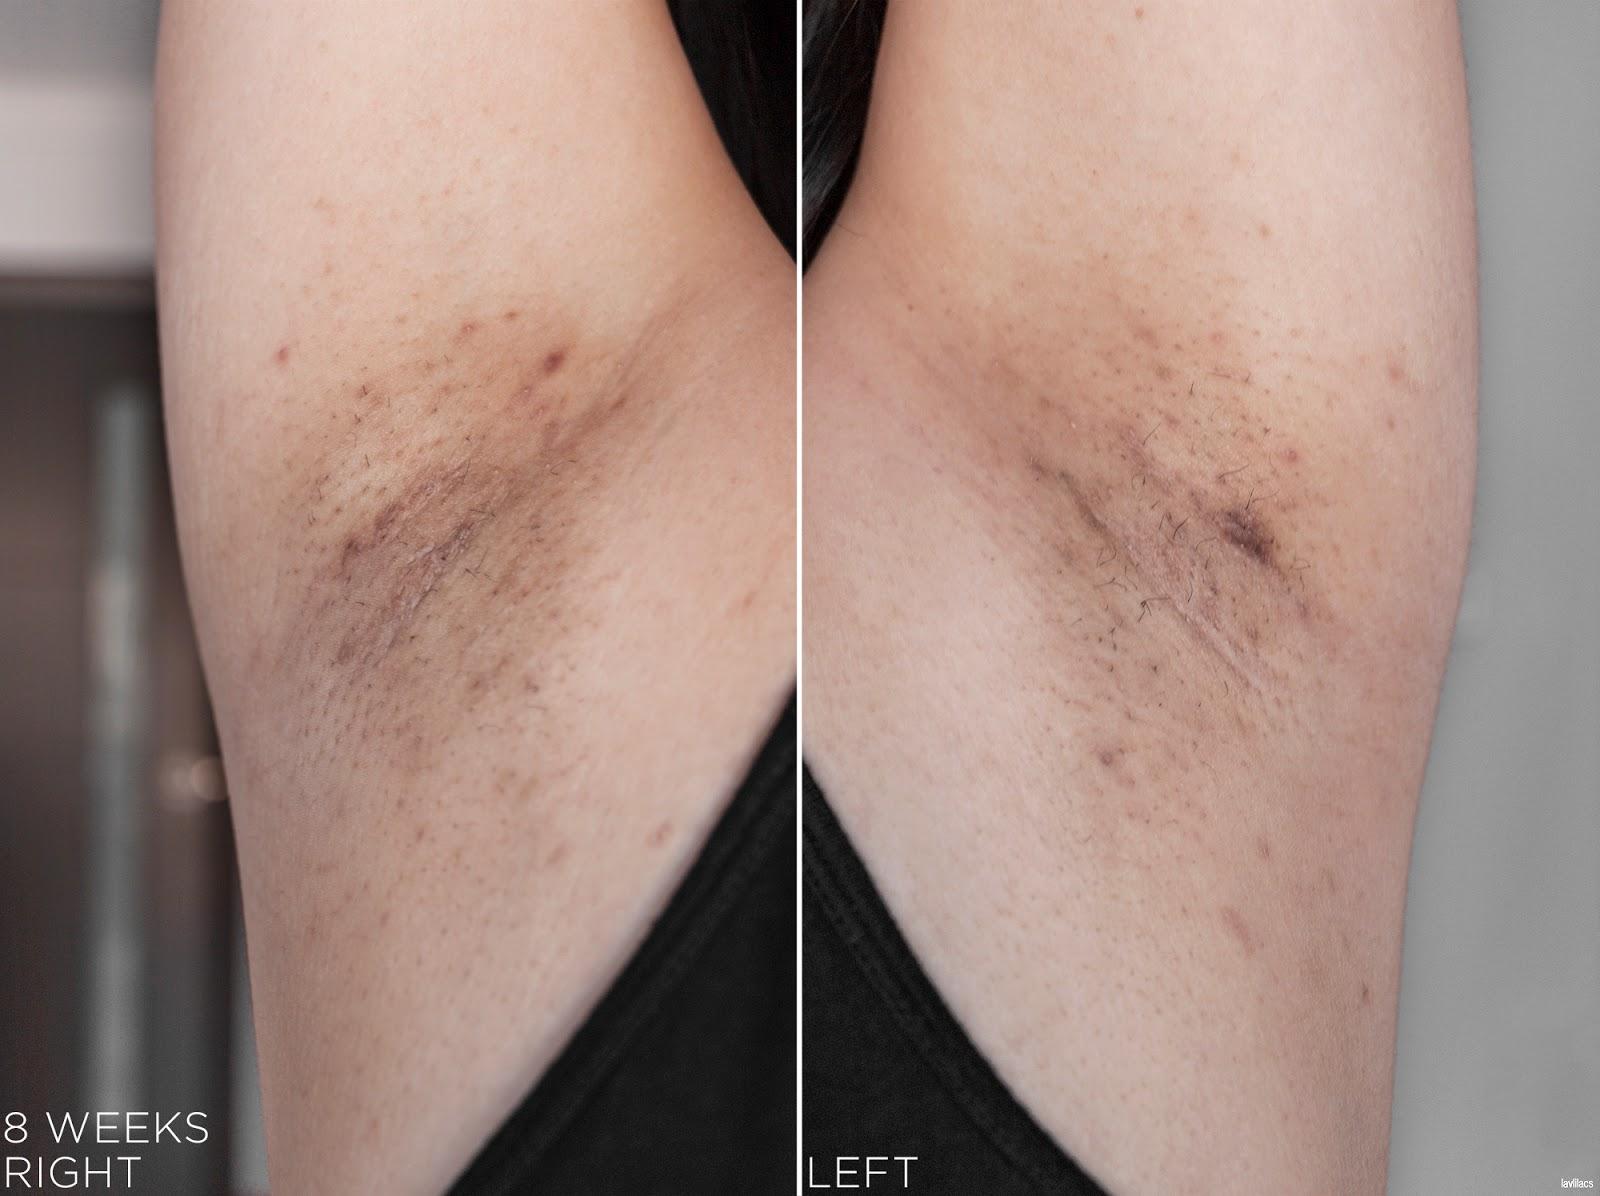 tria Hair Removal Laser Armpits Hair 8 Weeks